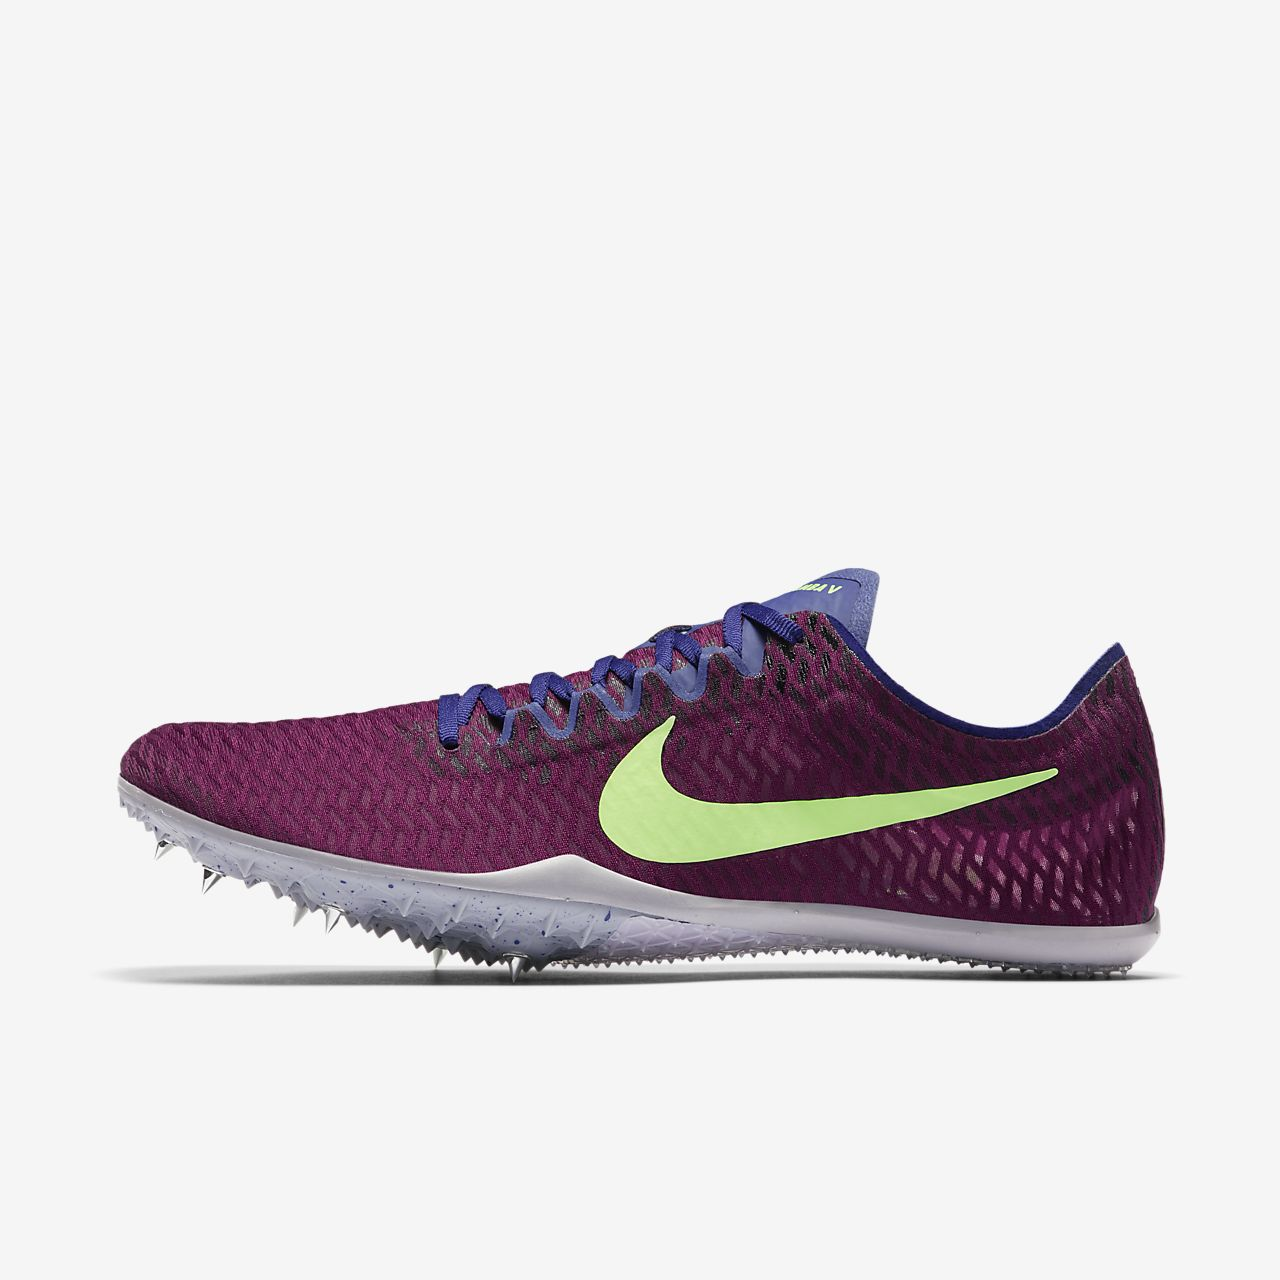 5 Zoom Ch Mamba Nike Running Scarpa Da WBqOczwAx8